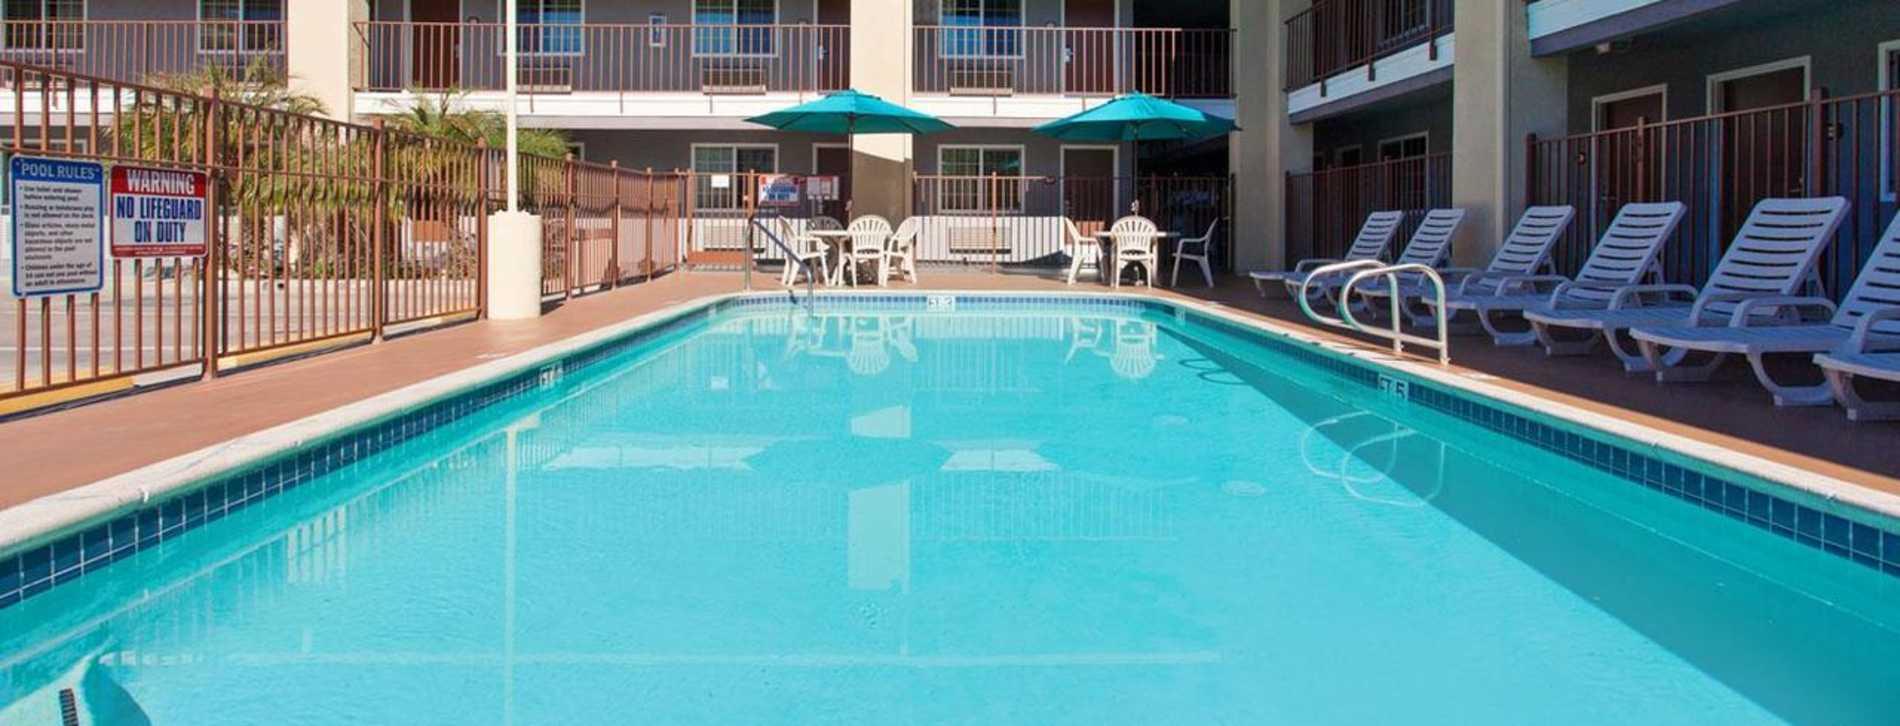 Pool - Ramada Inn Temecula